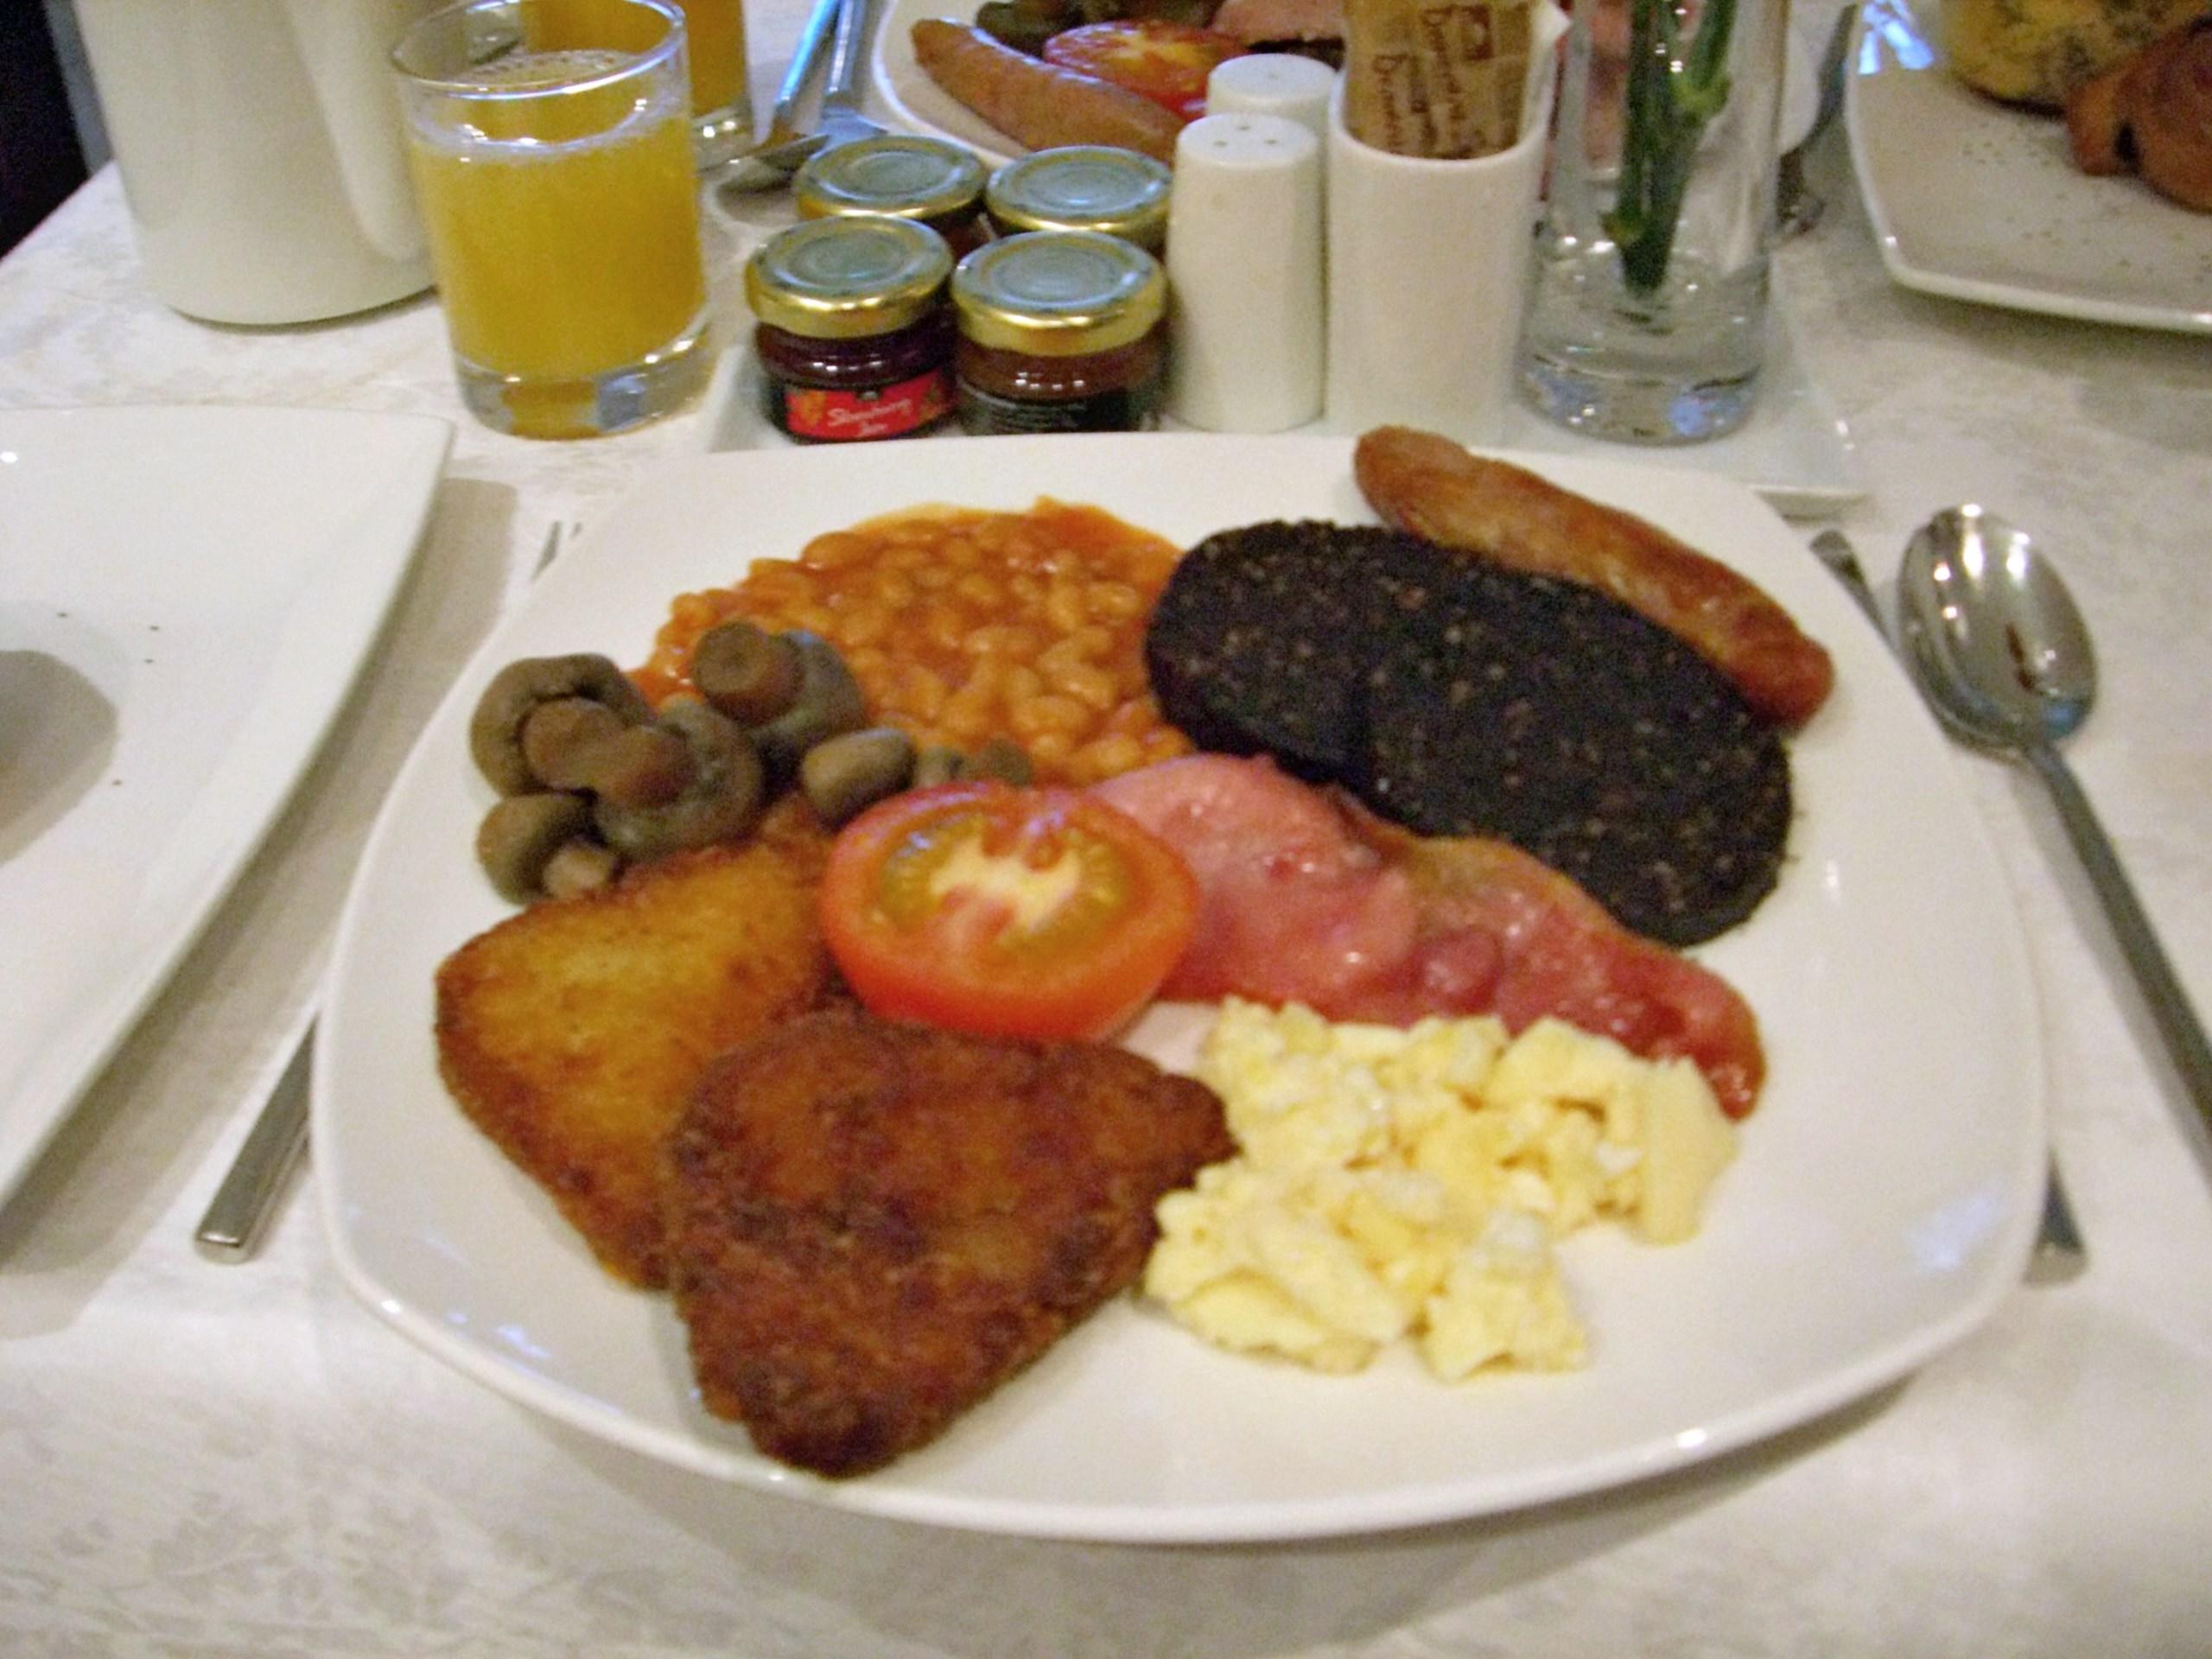 File:Full English Breakfast.JPG - Wikimedia Commons